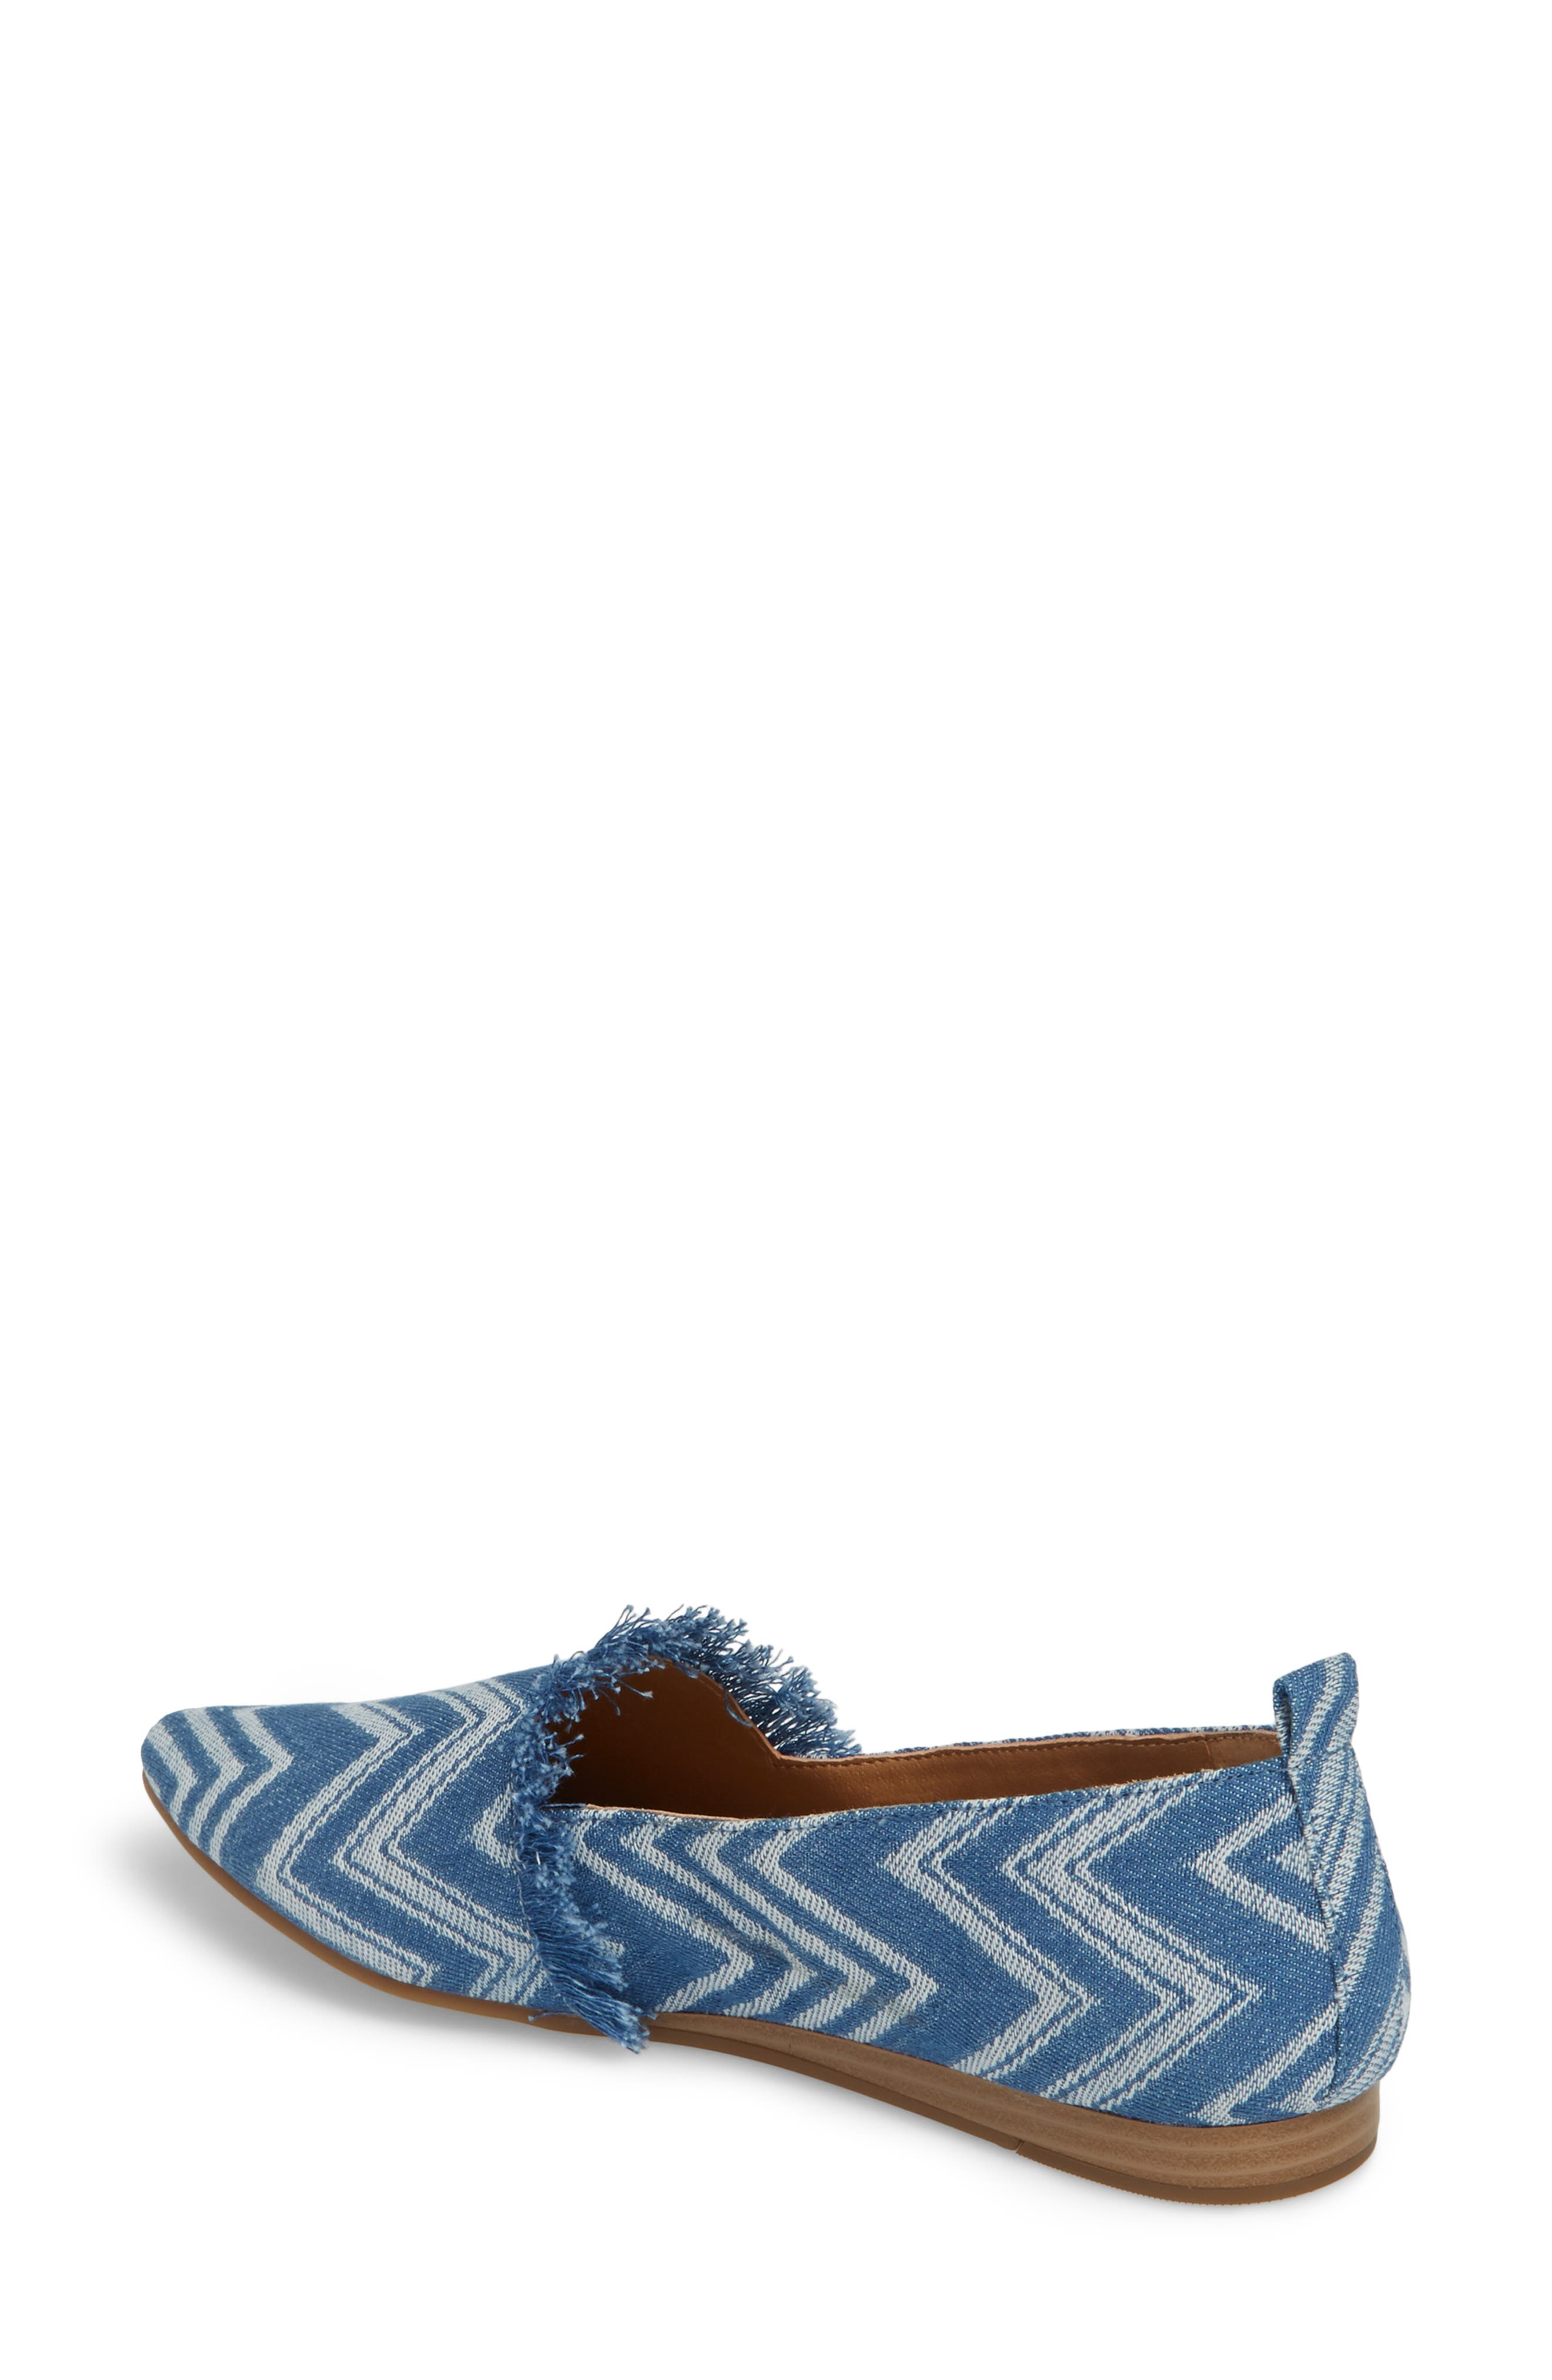 Alternate Image 2  - Lucky Brand Beechmer Pointy Toe Flat (Women)